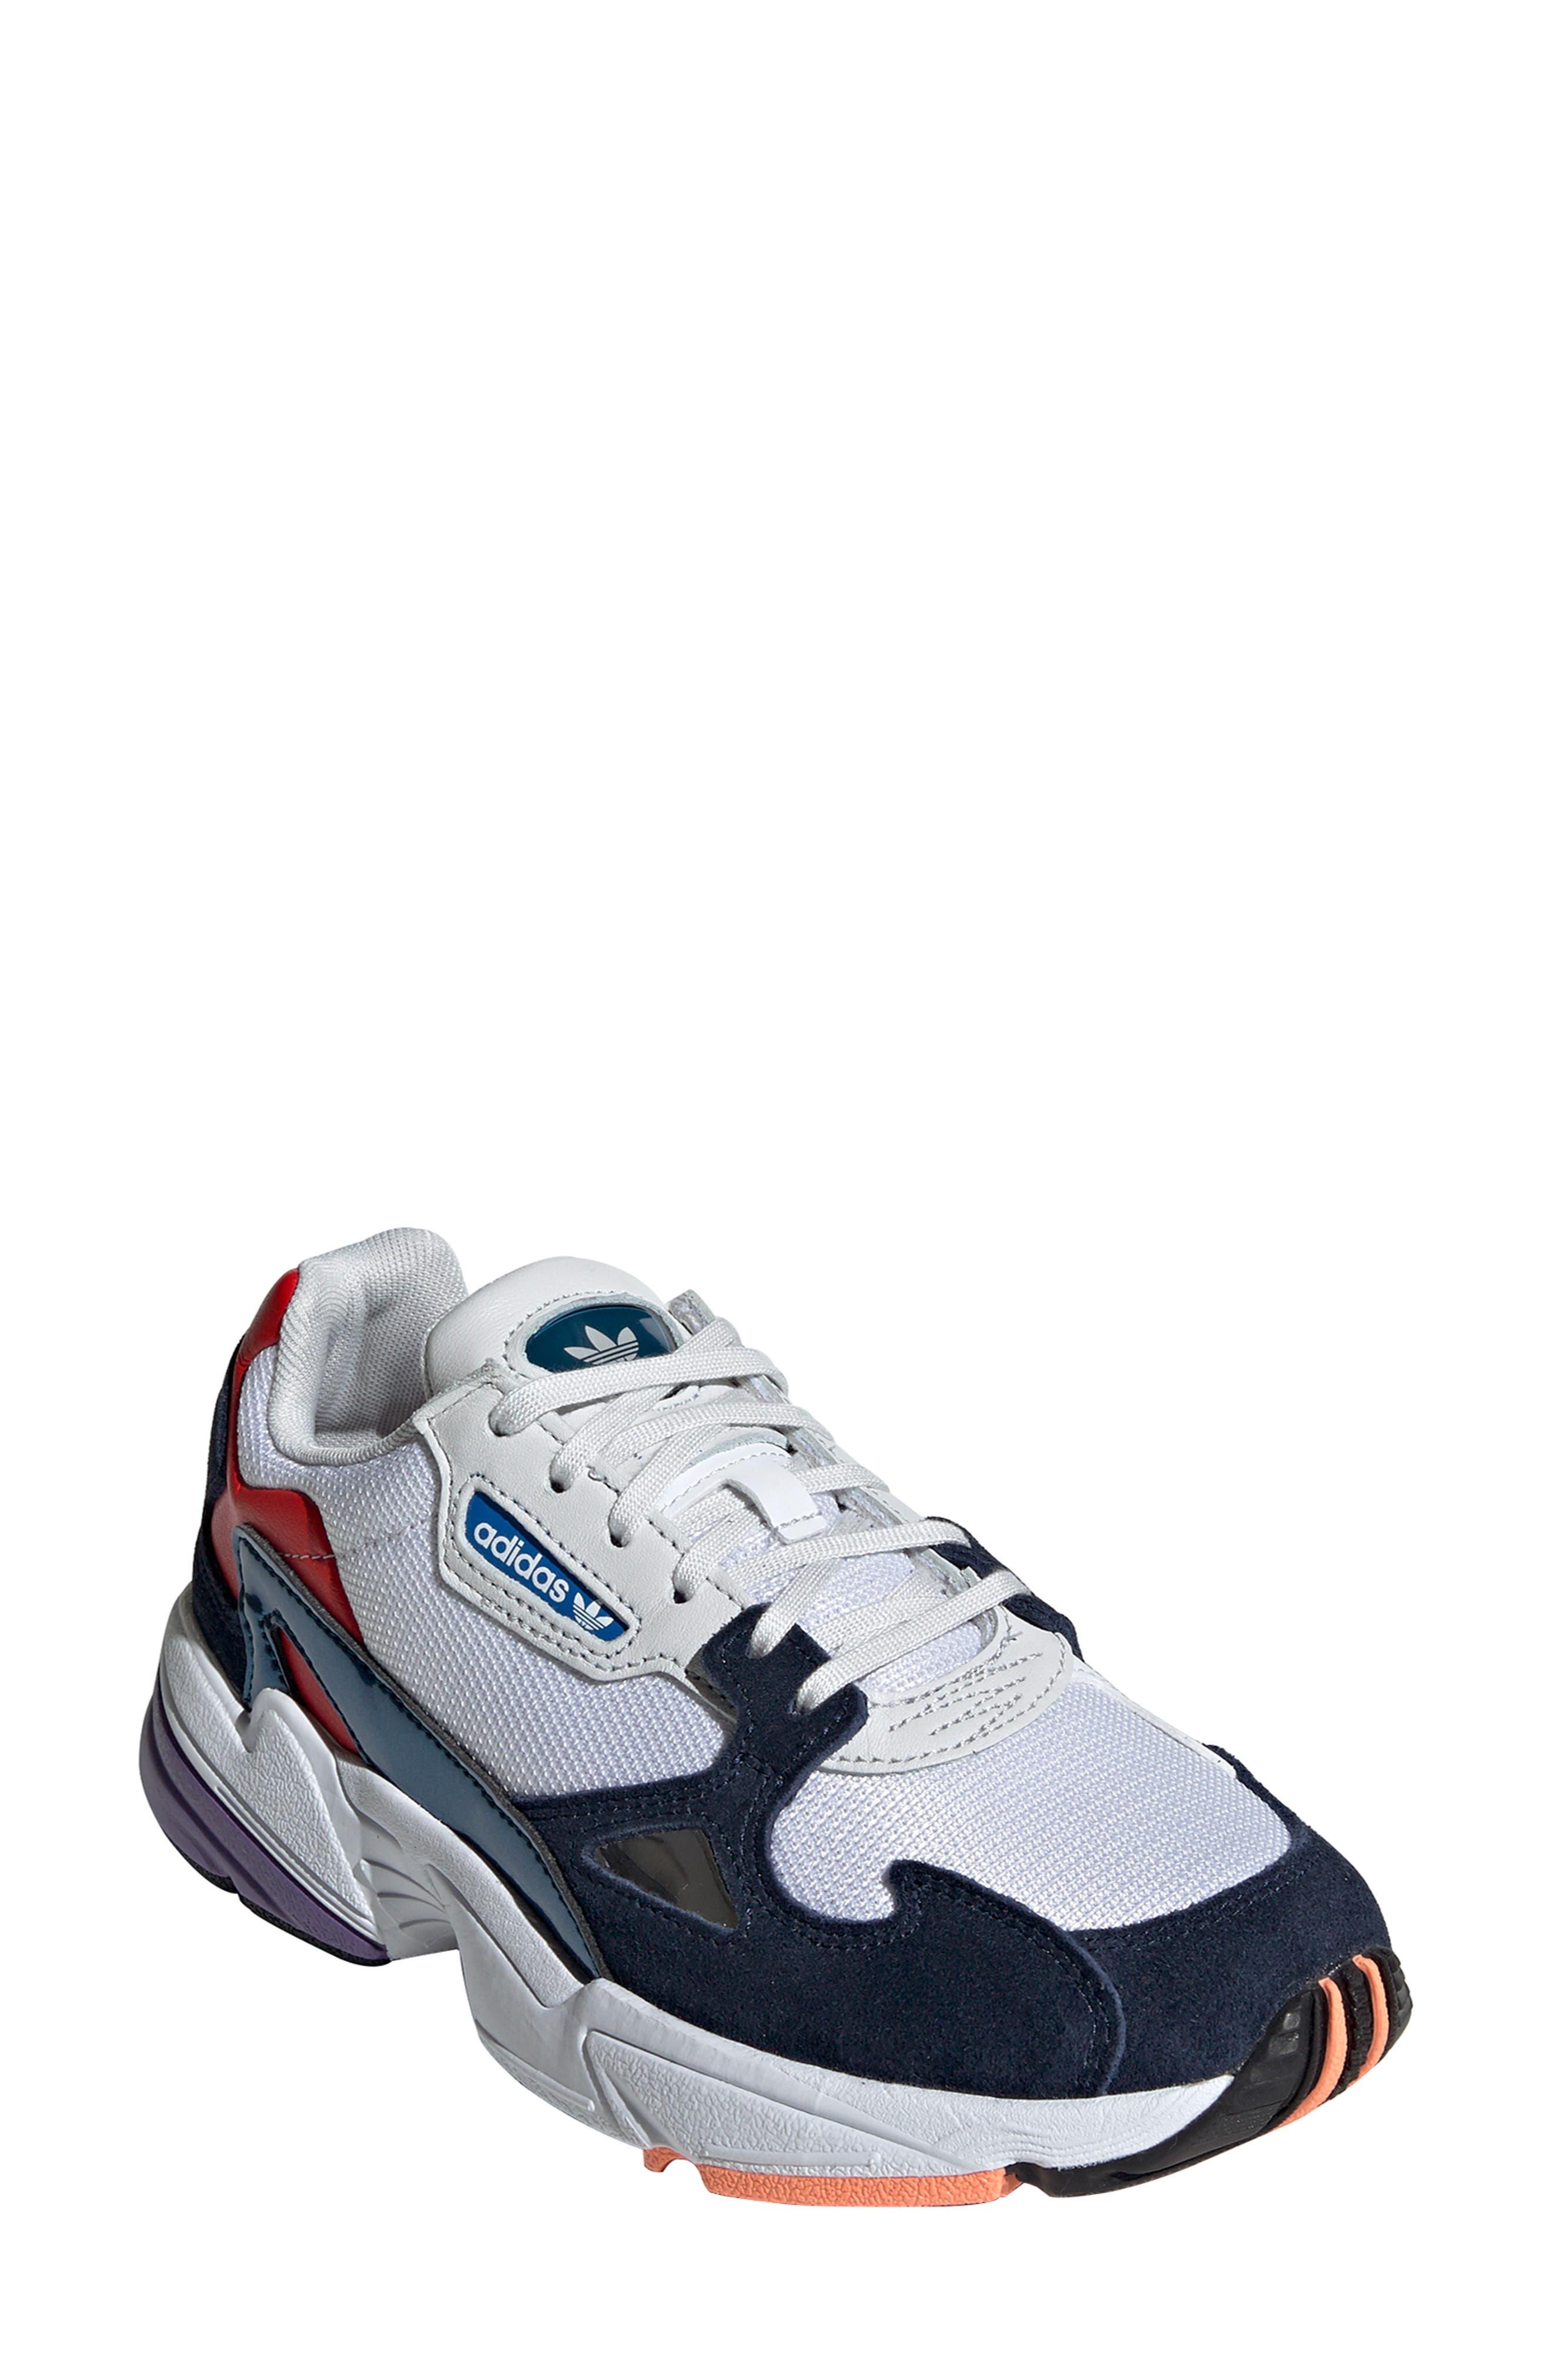 sale retailer bf3b9 f6295 Adidas Originals Women s Originals Falcon Casual Shoes, White In Crystal  White S16